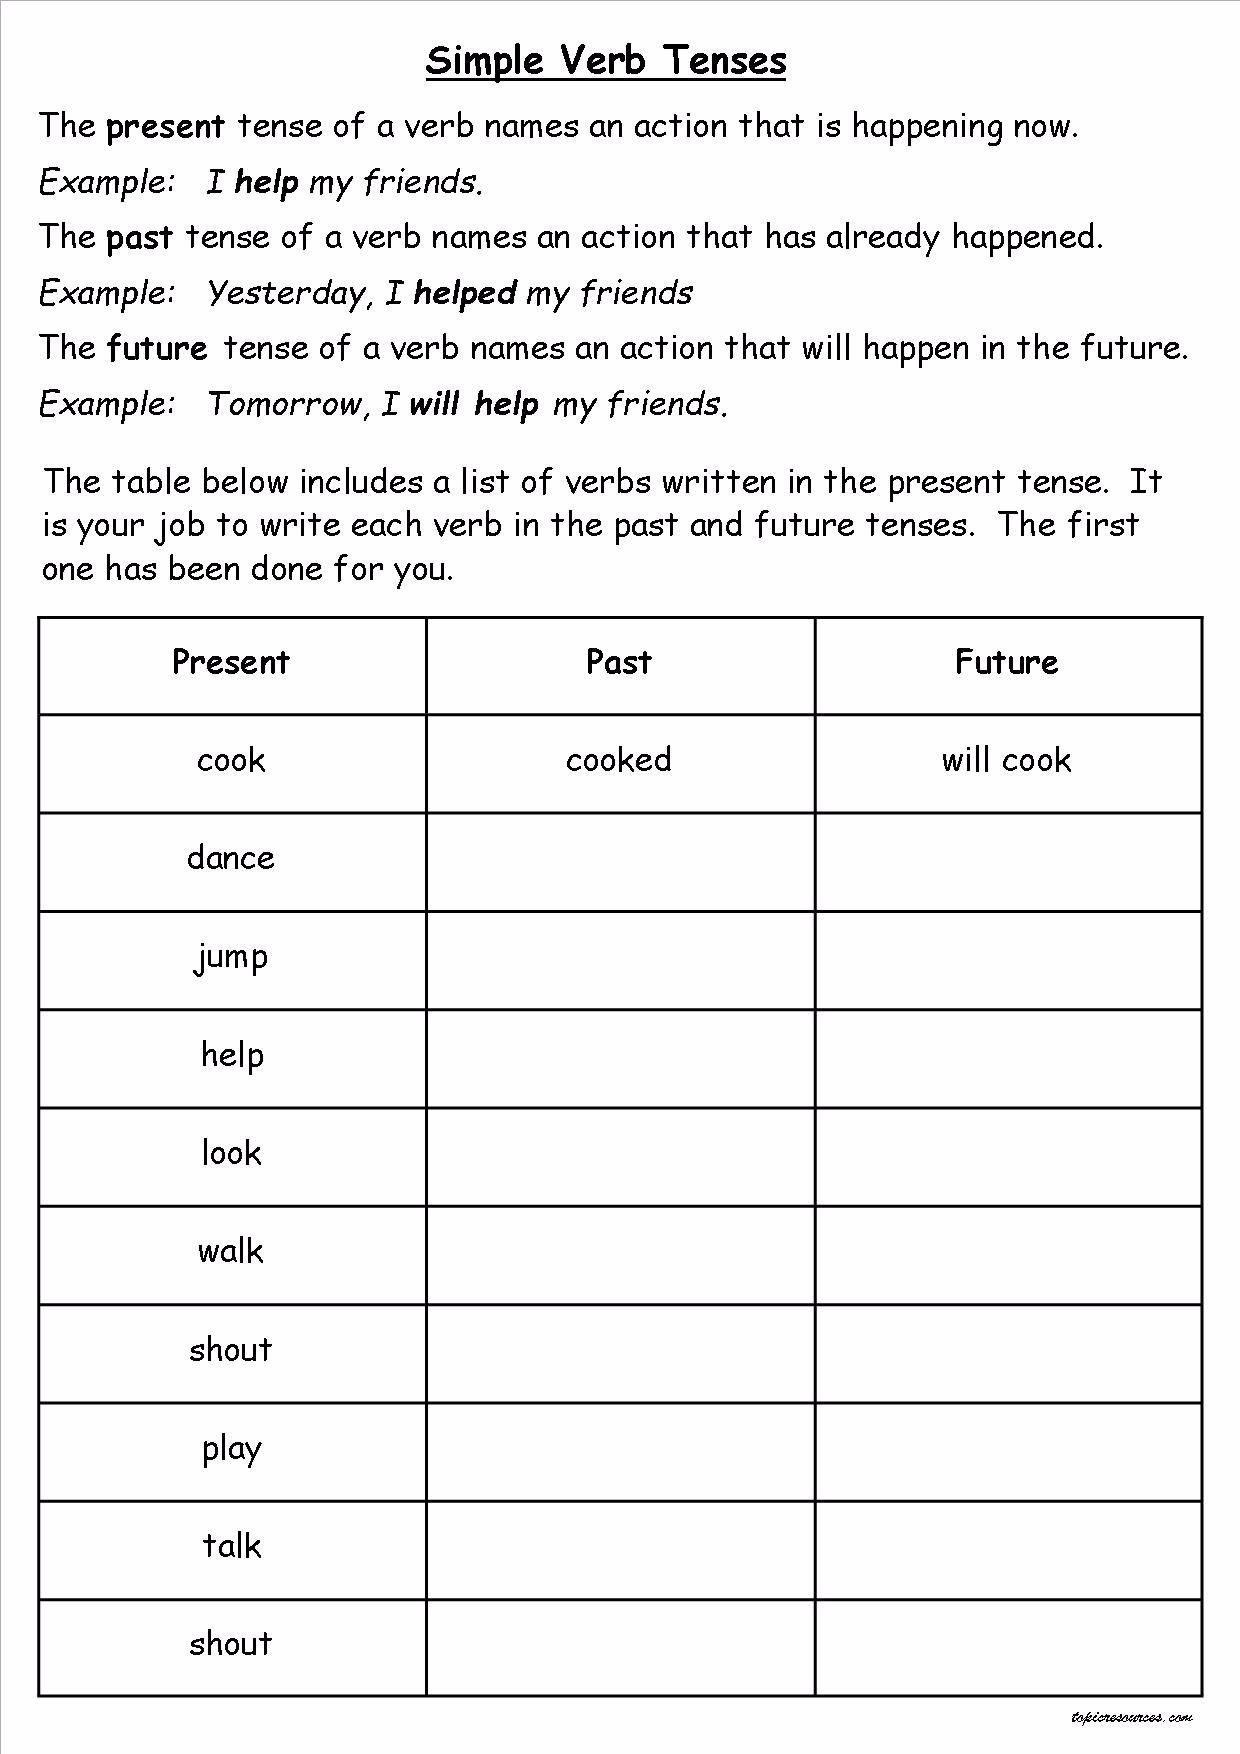 100 writing prompts questions ks2